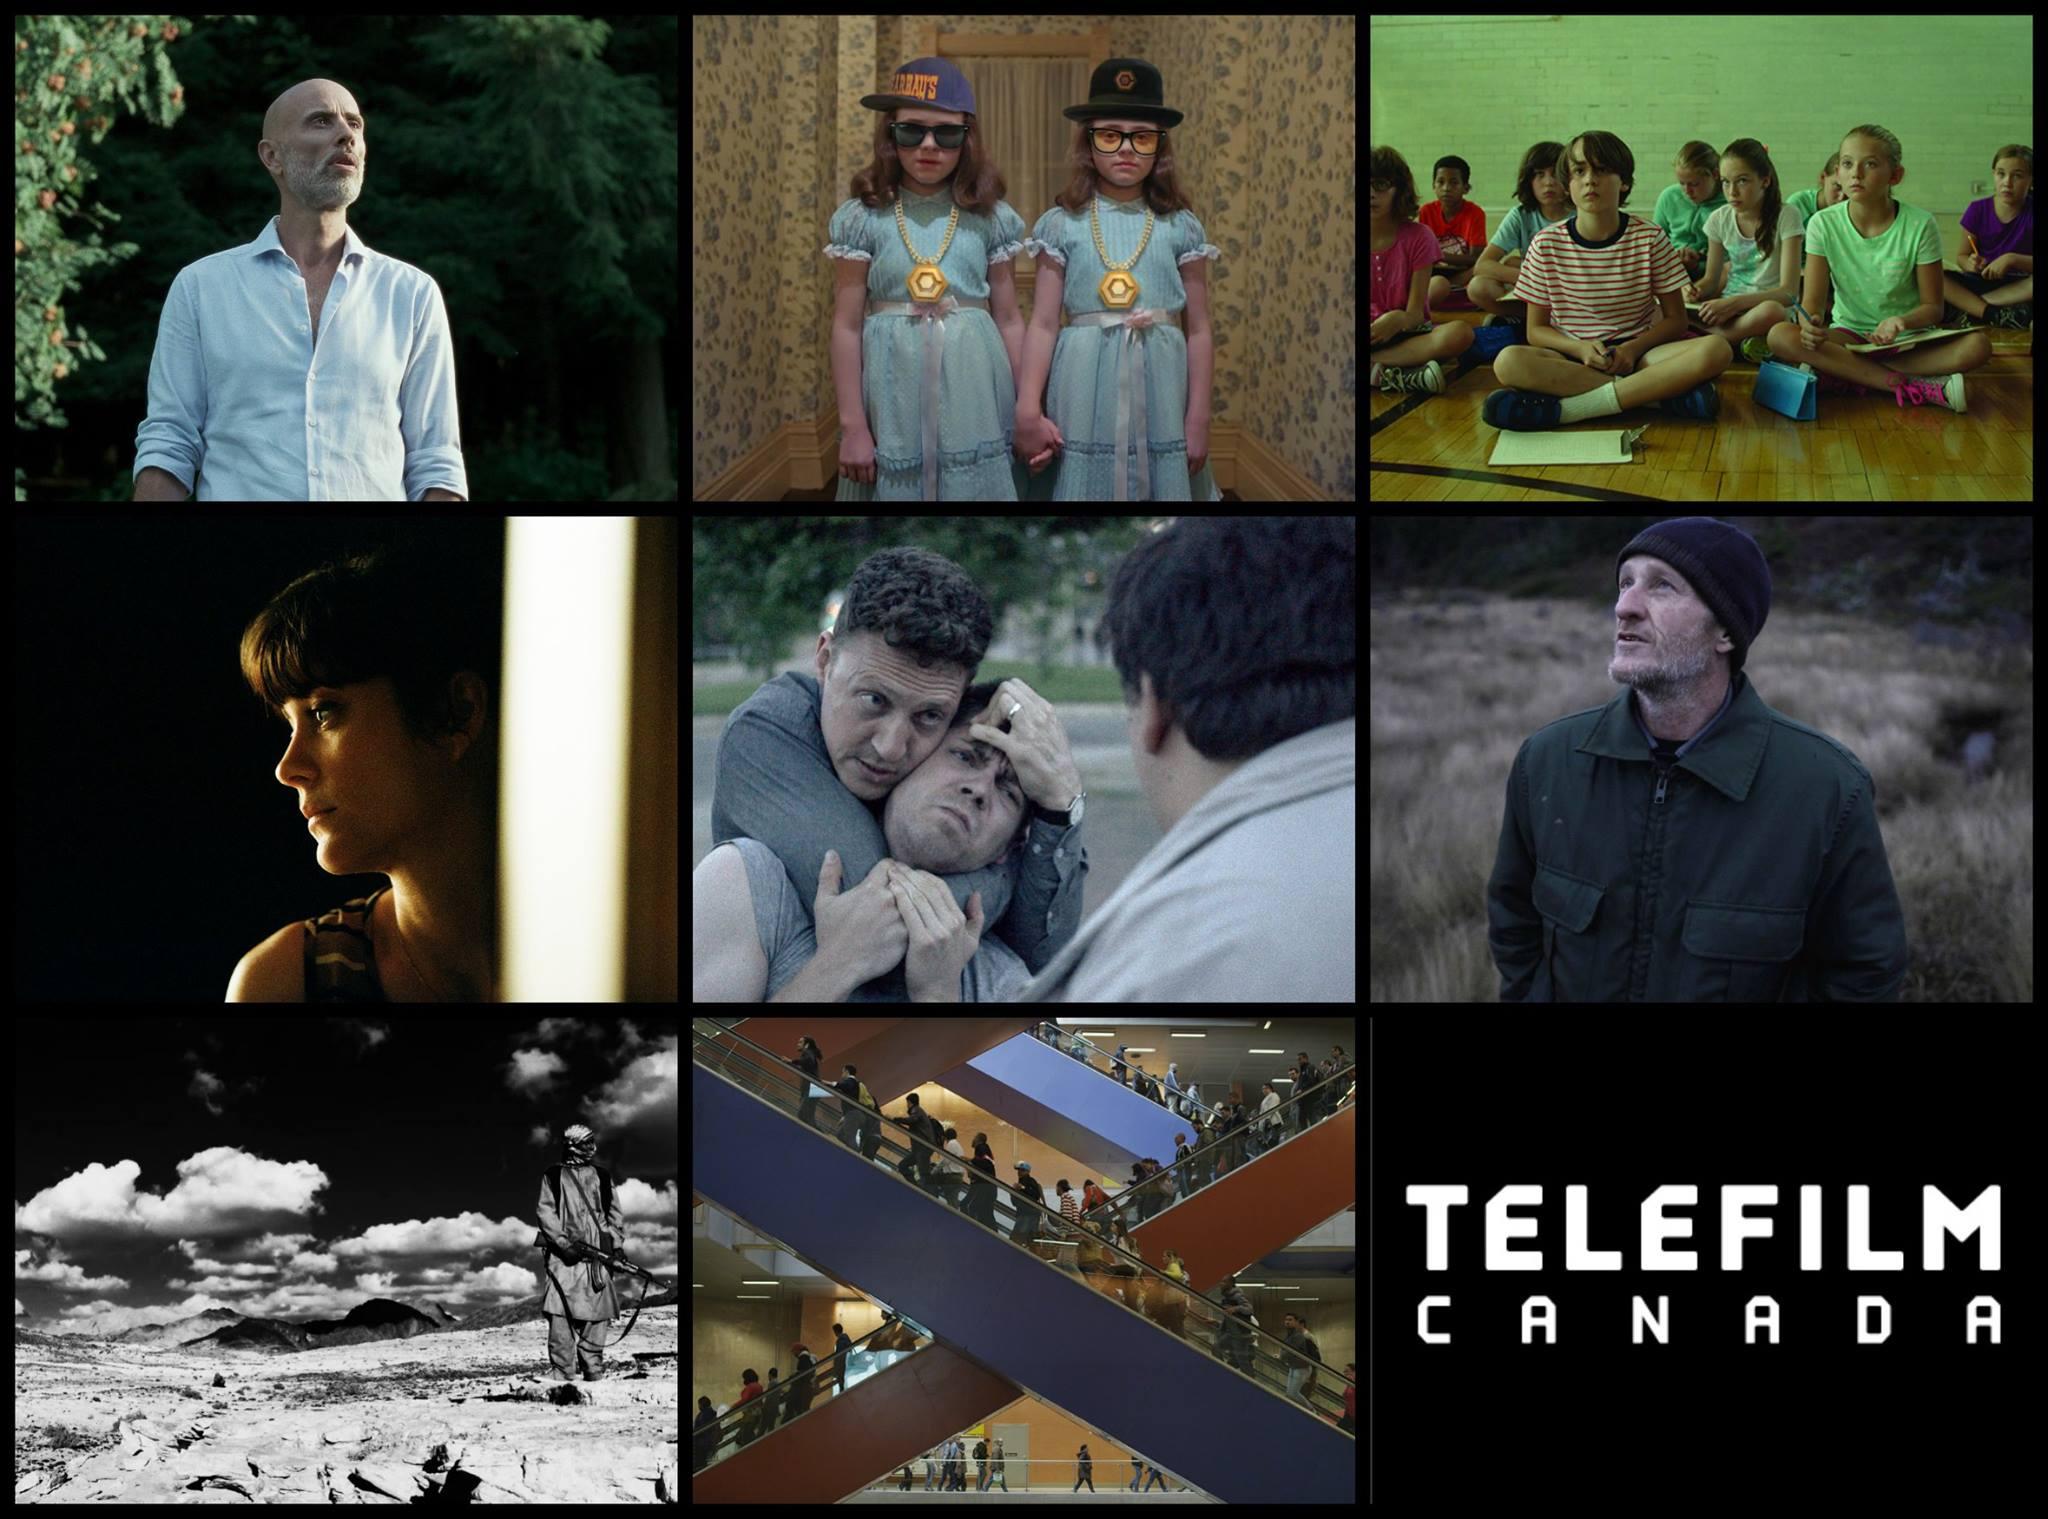 Huit films canadiens au 51e Festival de Karlovy Vary 2016